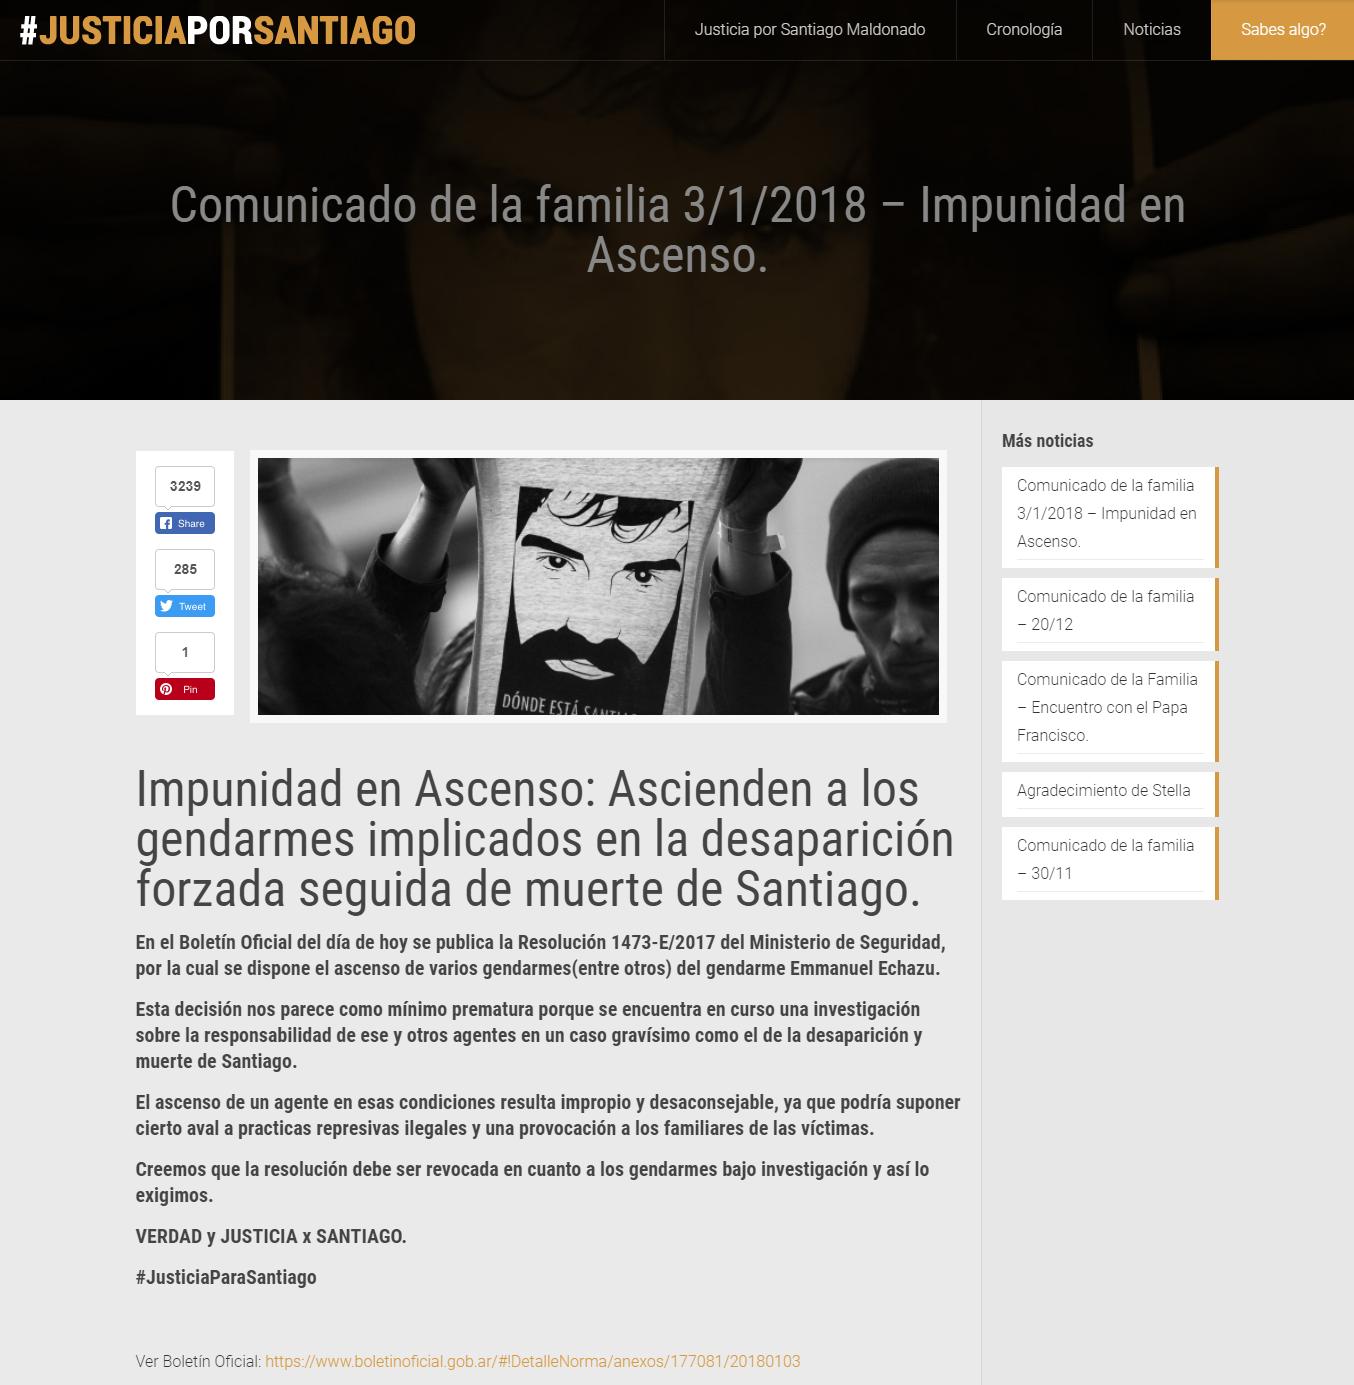 FireShot Capture 386 - Comunicado de la familia 3_1_2018 - I_ - http___www.santiagomaldonado.com_c